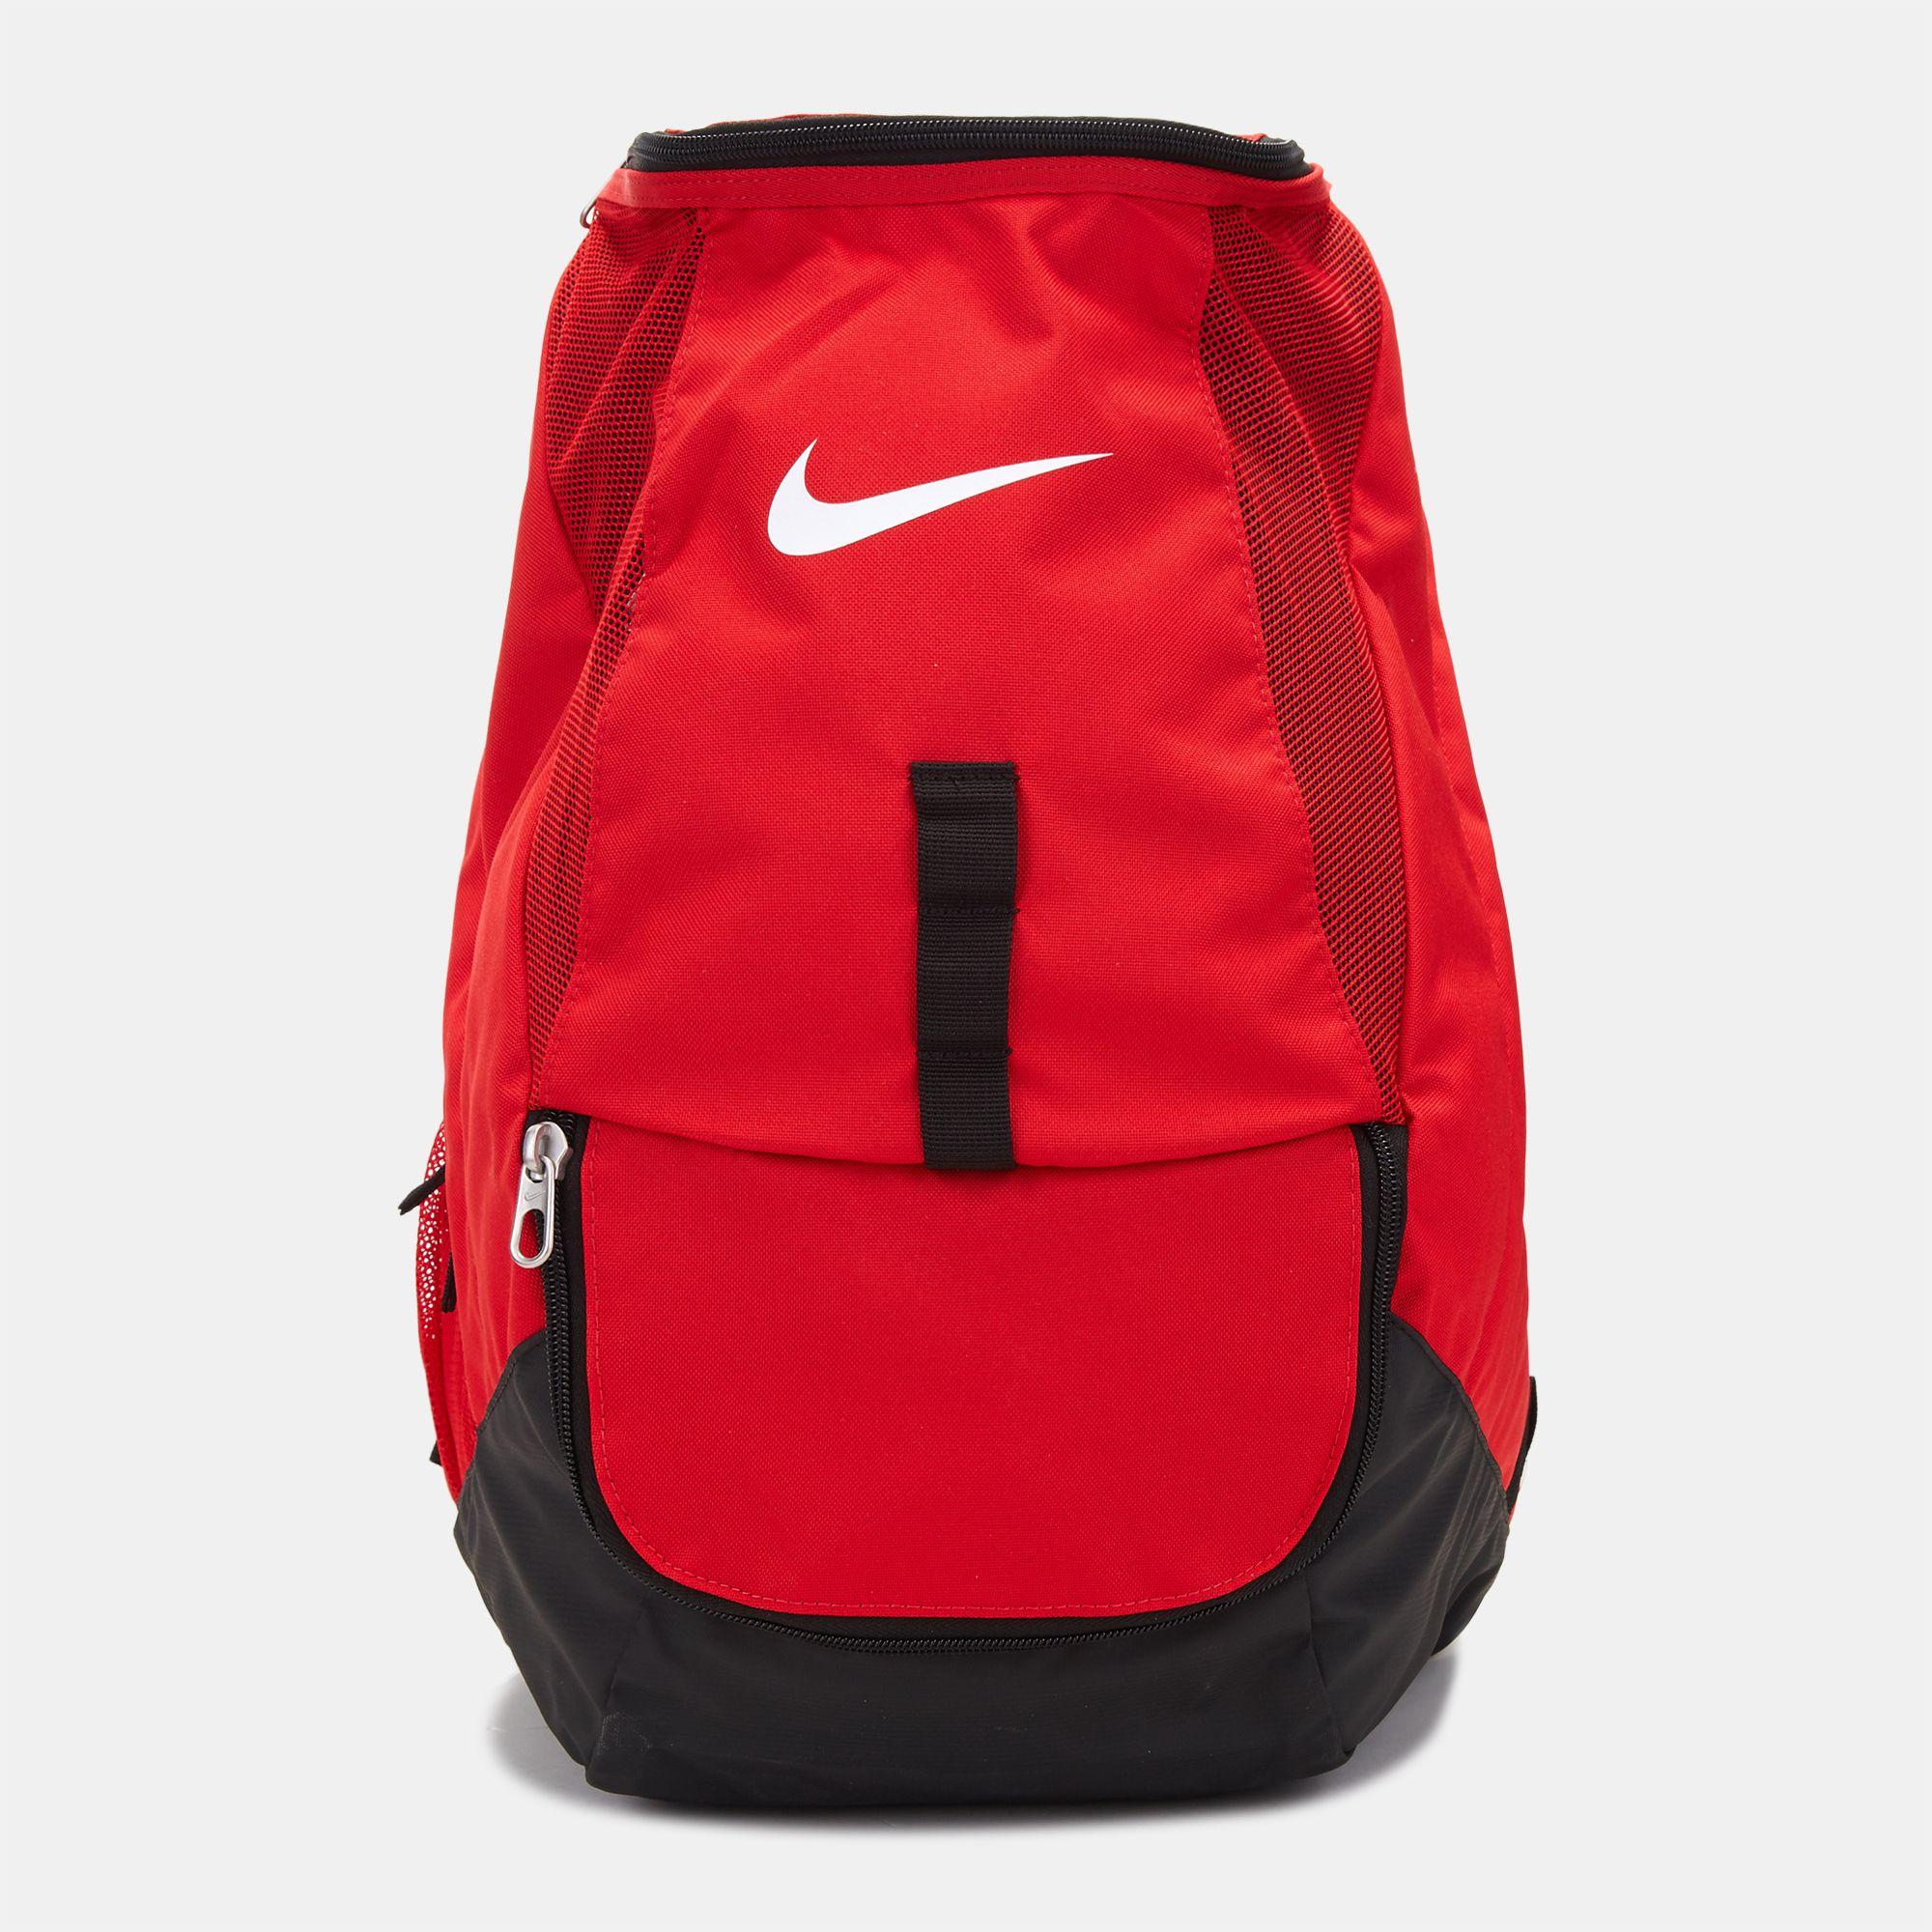 f6f69dbd68 Nike Club Team Backpack Rucksack- Fenix Toulouse Handball